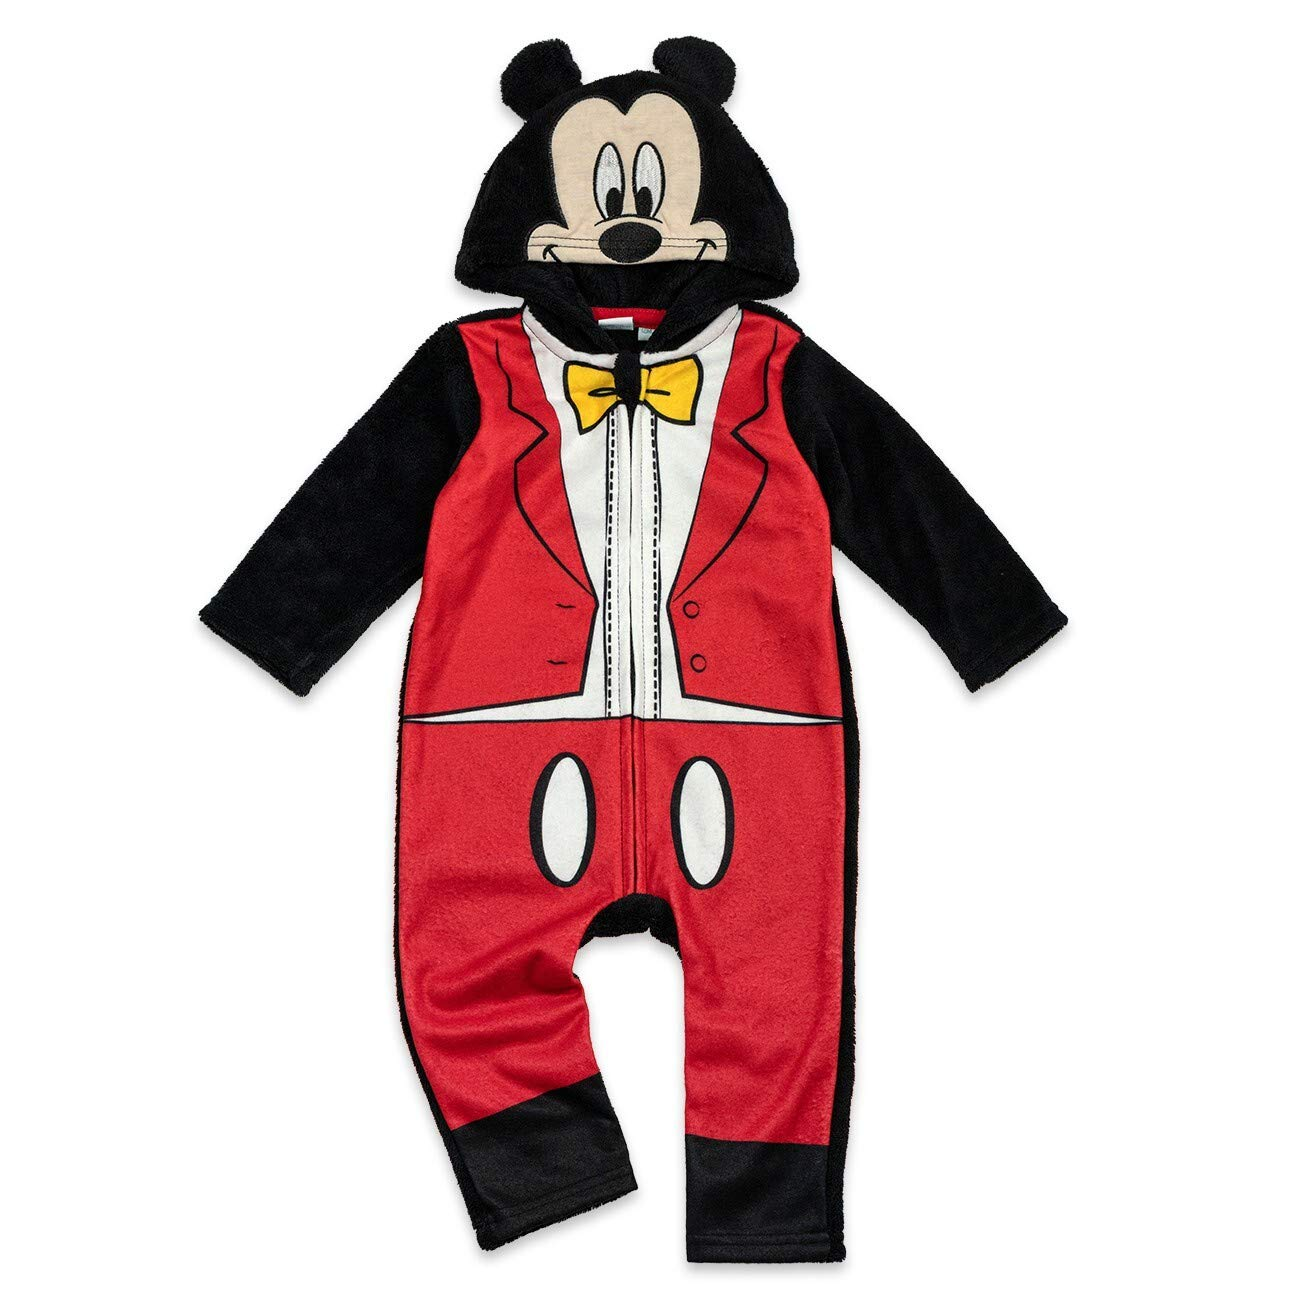 80 Baby Overall mit Kapuze f/ür Neugeborene /& Kleinkinder Motiv: Mickey Mouse Frack Gr/ö/ße: 9-12 Monate Disney Baby Strampler Jungen rot schwarz